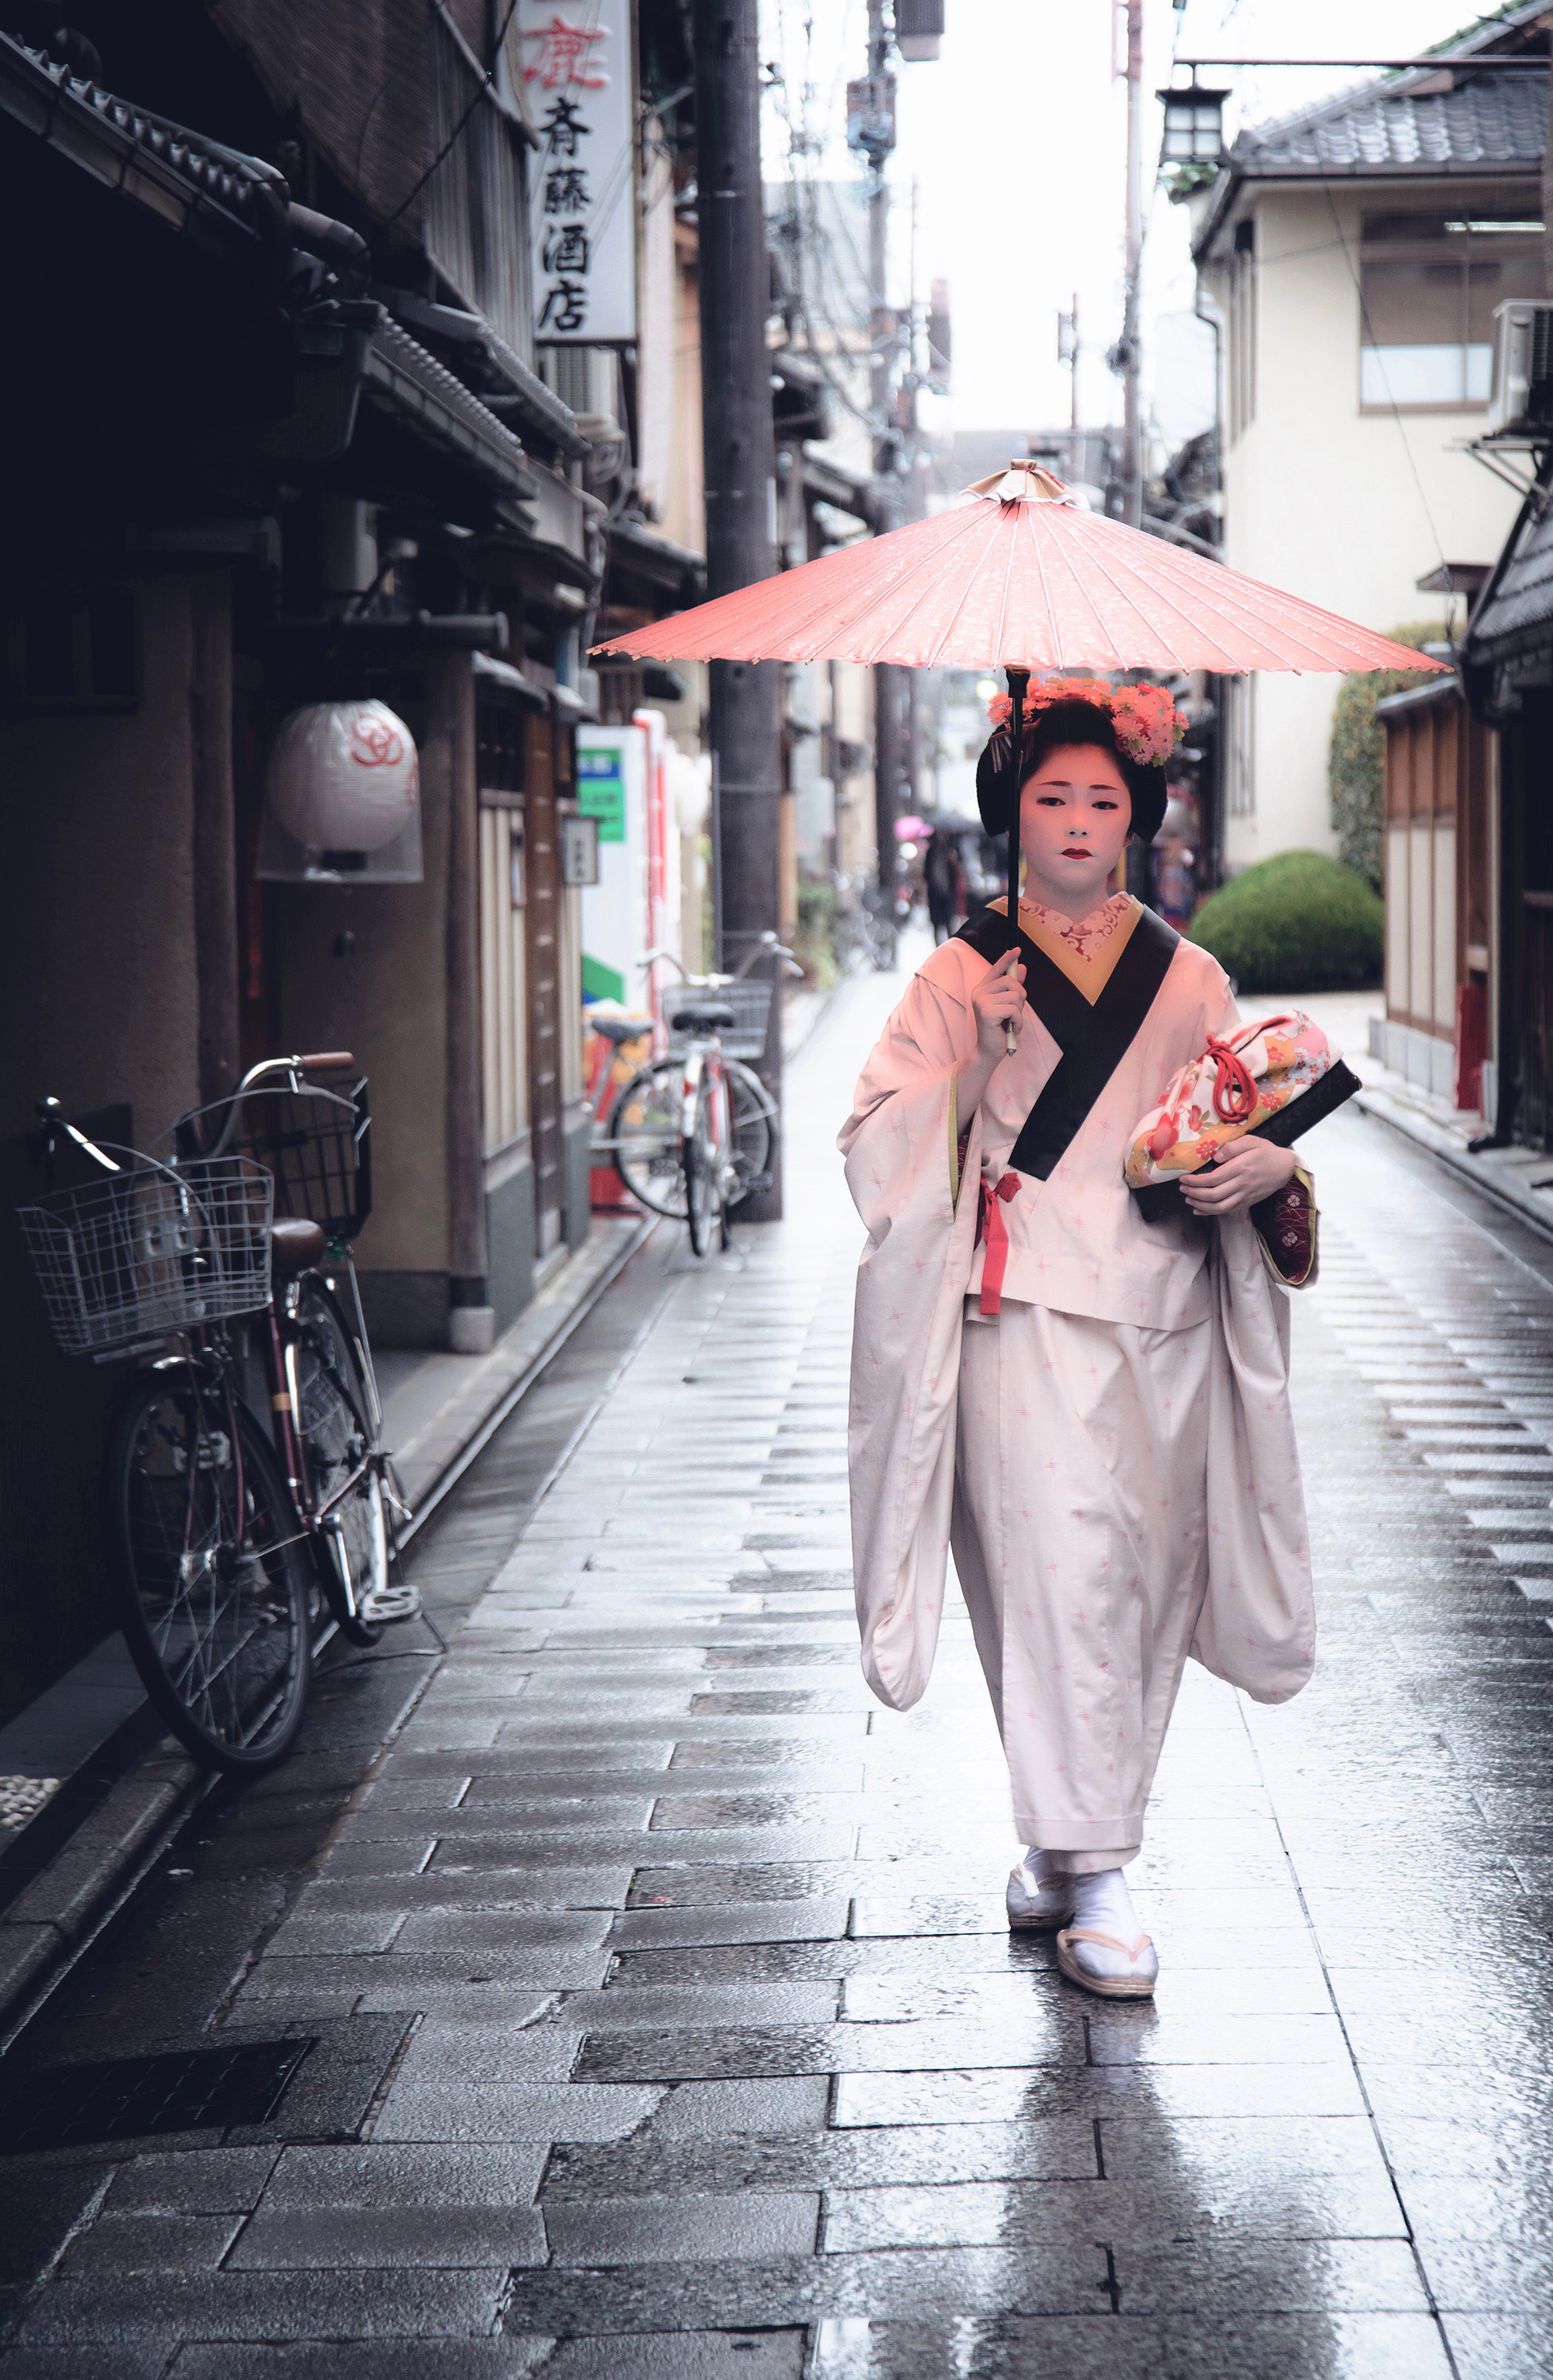 A Geisha in Training-Kyoto Japan